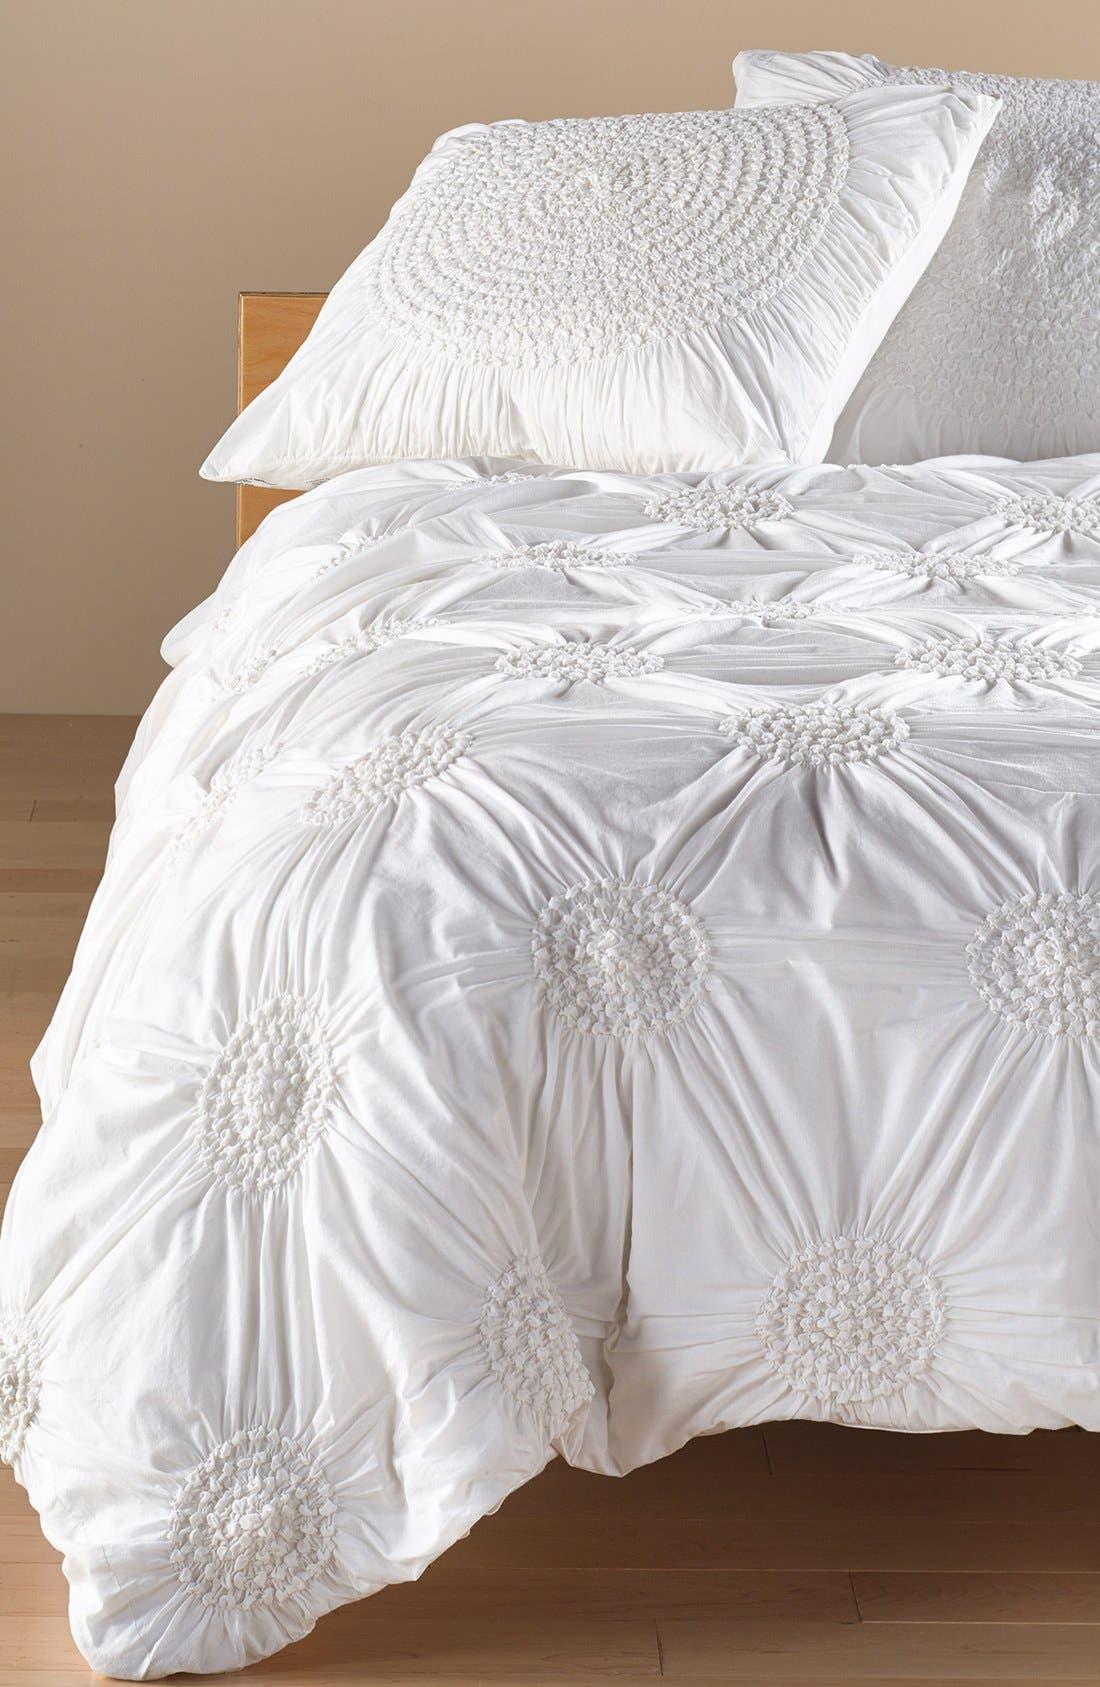 Bedspread designs texture - Bedspread Designs Texture 15